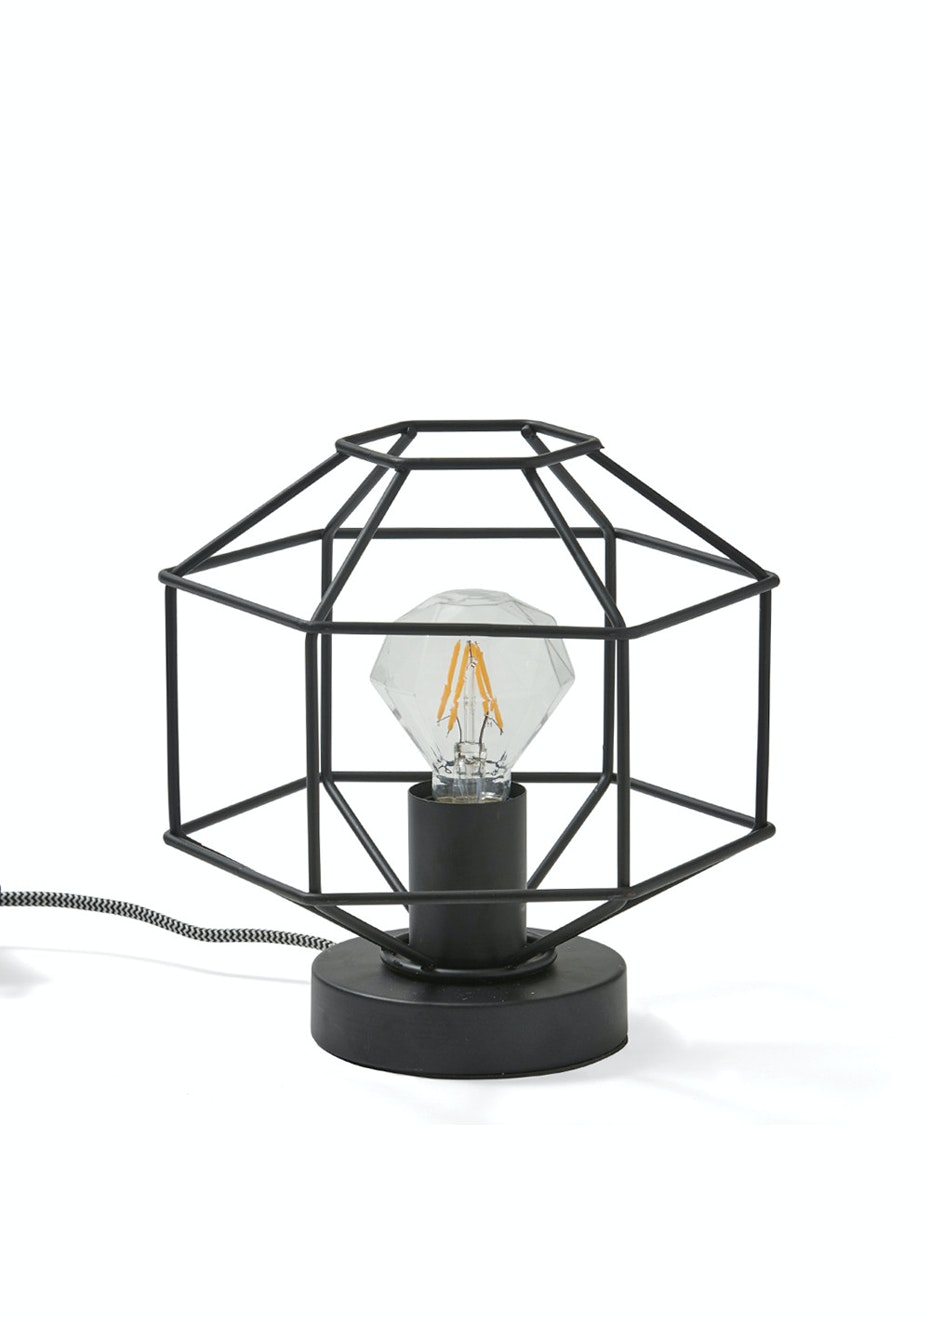 Me & My Trend - Black Diamond Lamp